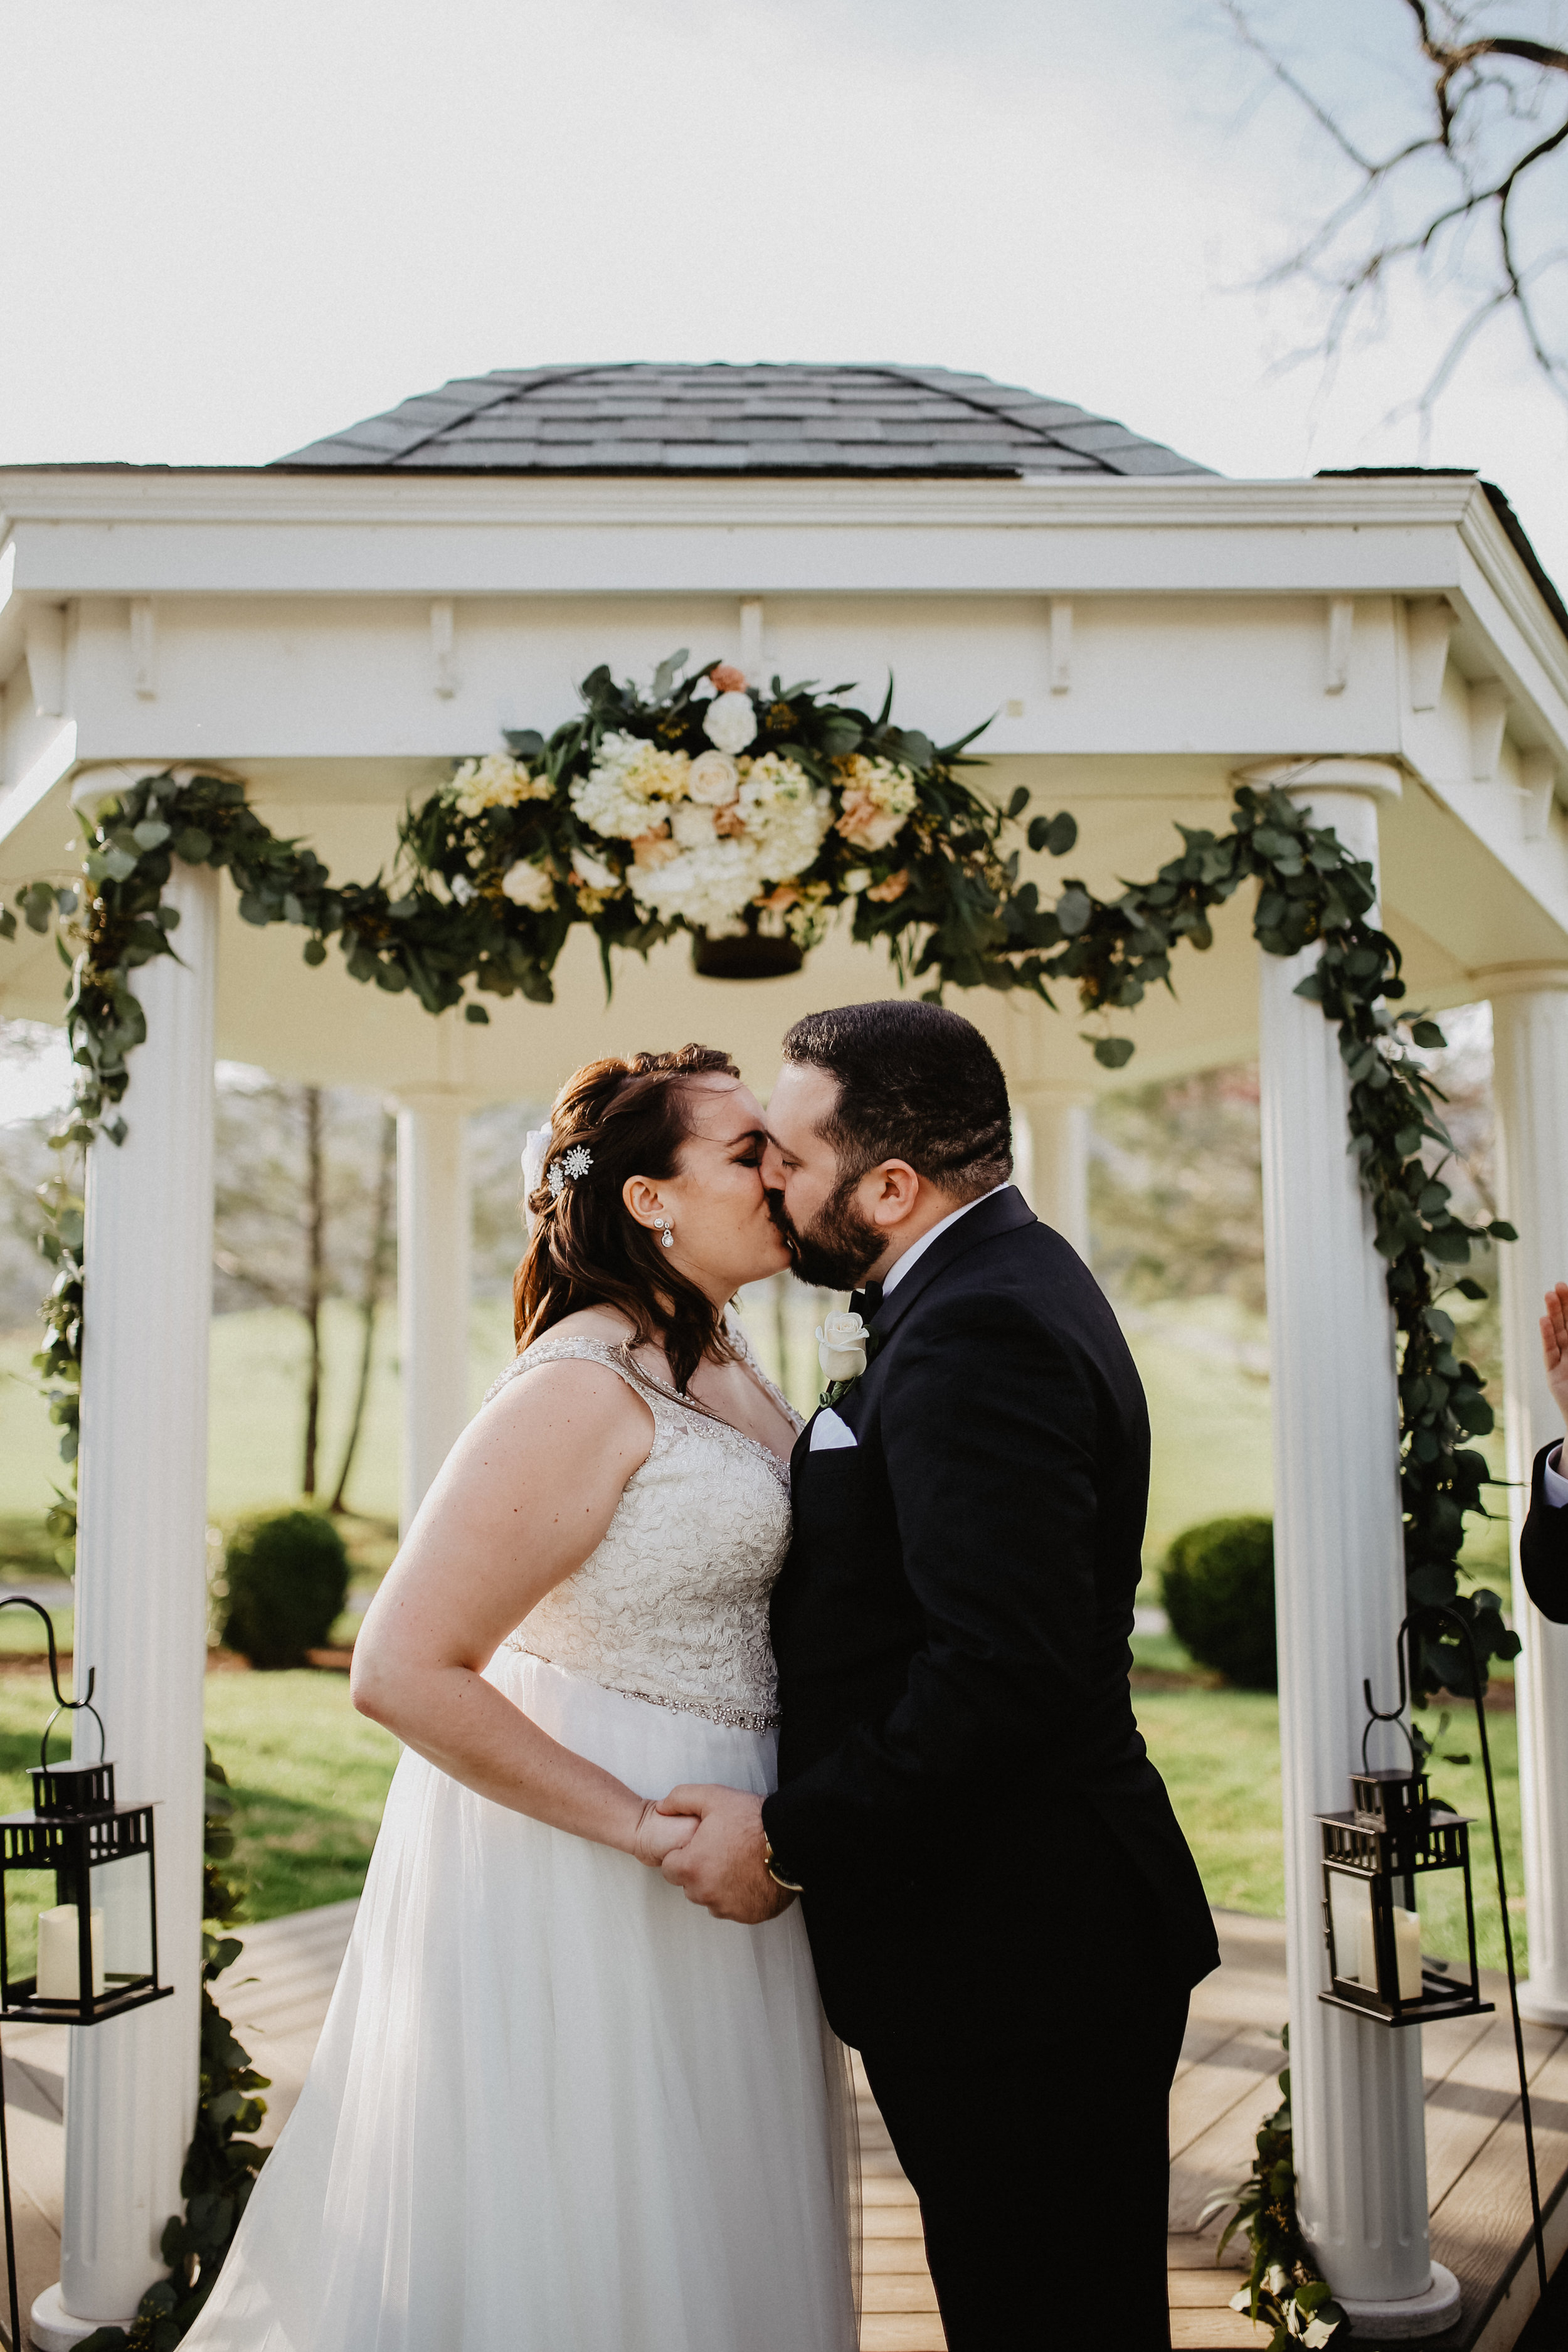 AnthonyKyndra_Married_2018-322.jpg